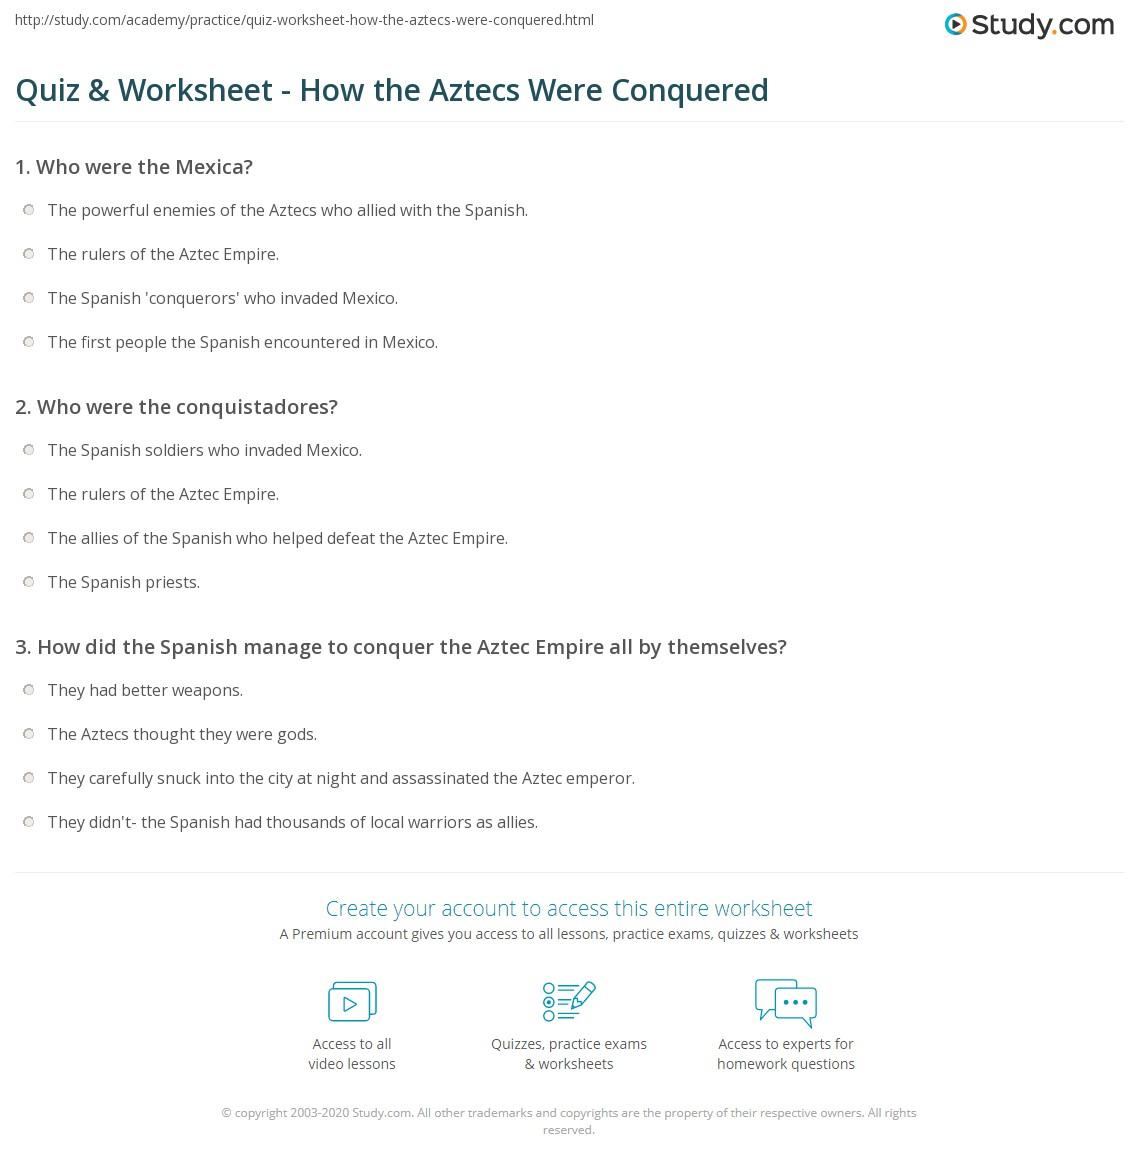 worksheet Analogy Worksheets For 5th Grade world teachers press worksheets garciniapremiums quiz amp worksheet how the aztecs were conquered study com